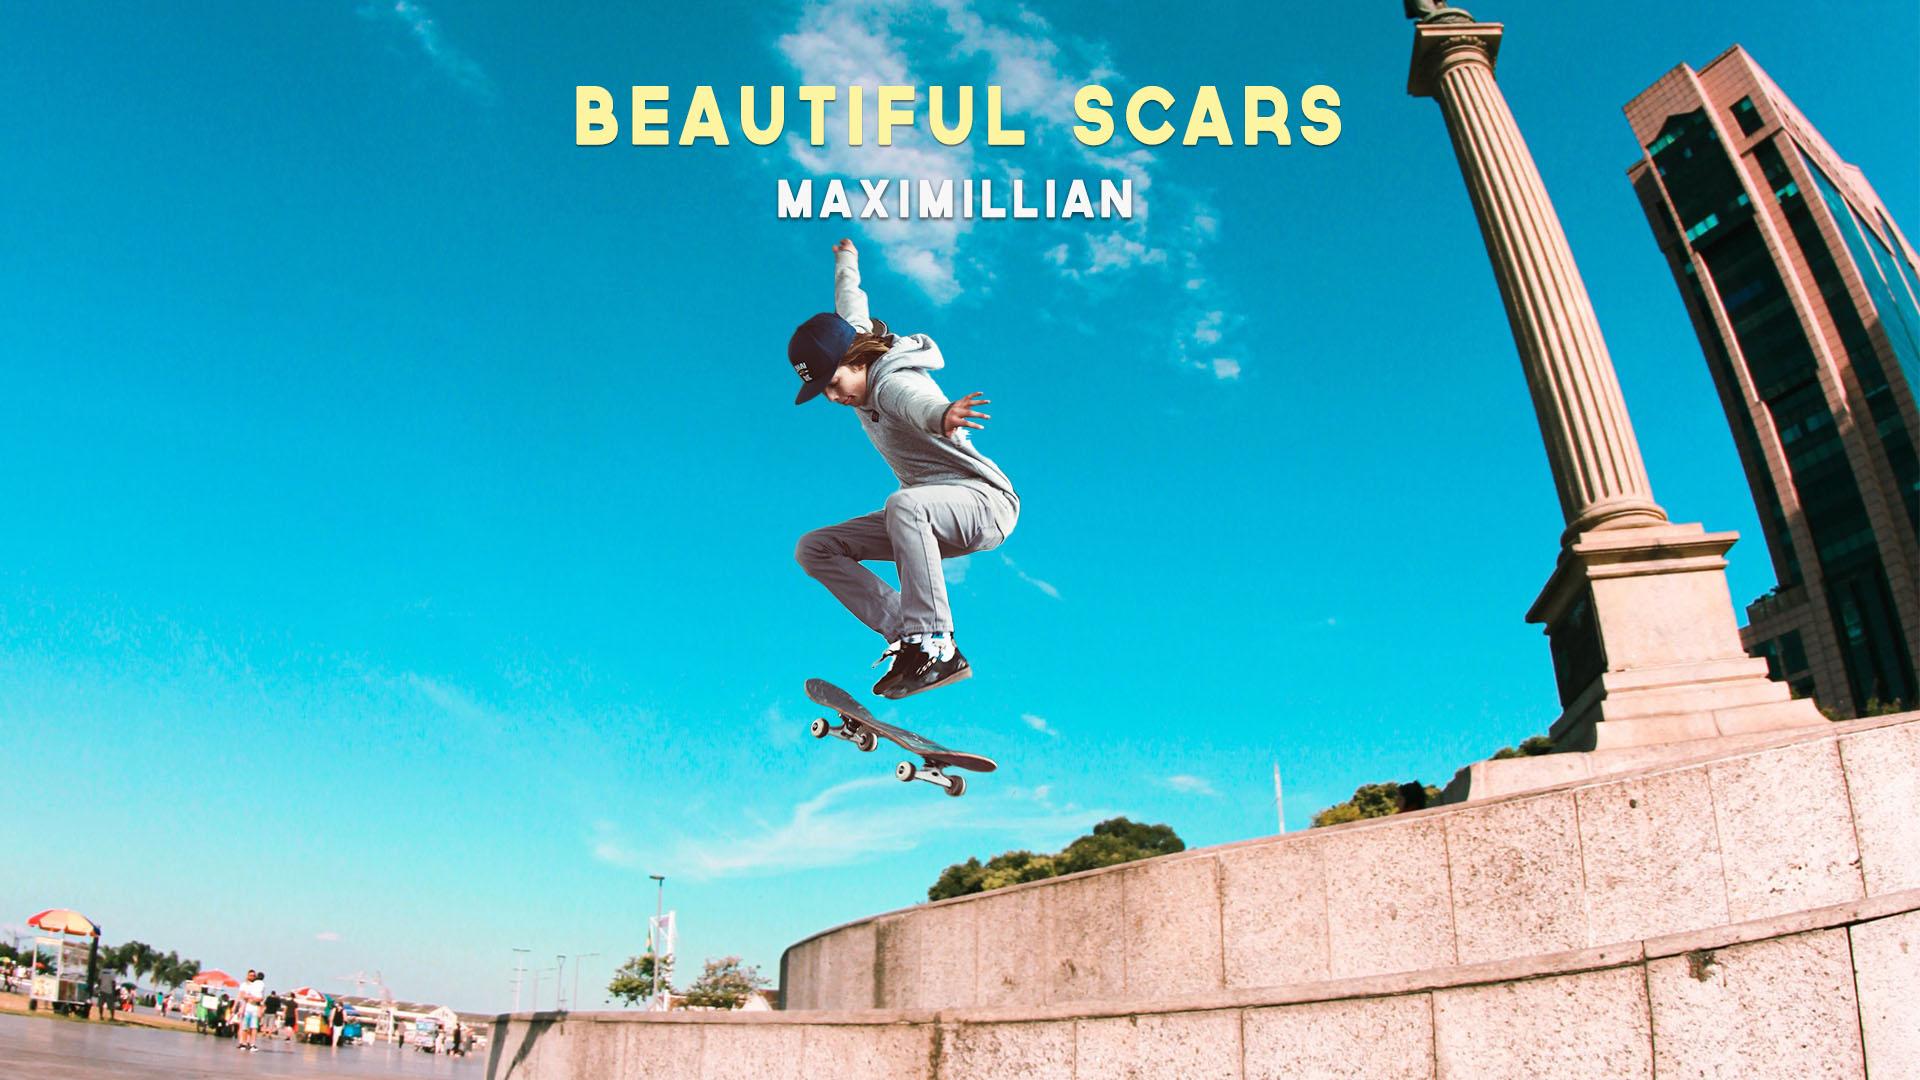 Beautiful Scars - Maximillian Girl Boy Skateboarding